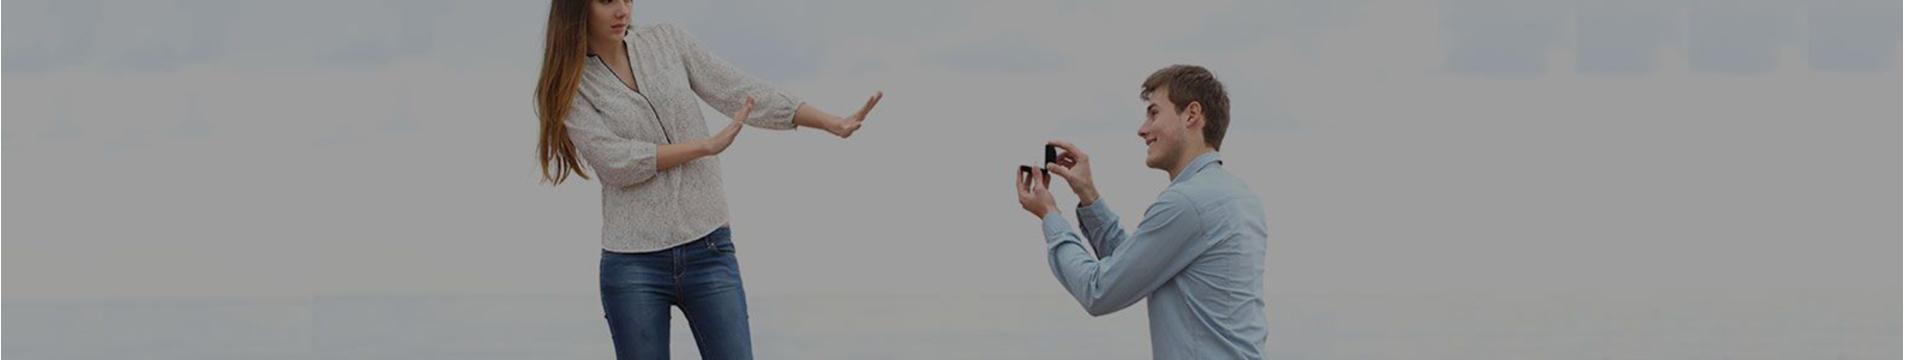 wedding-proposal-fail-blog-header.jpg